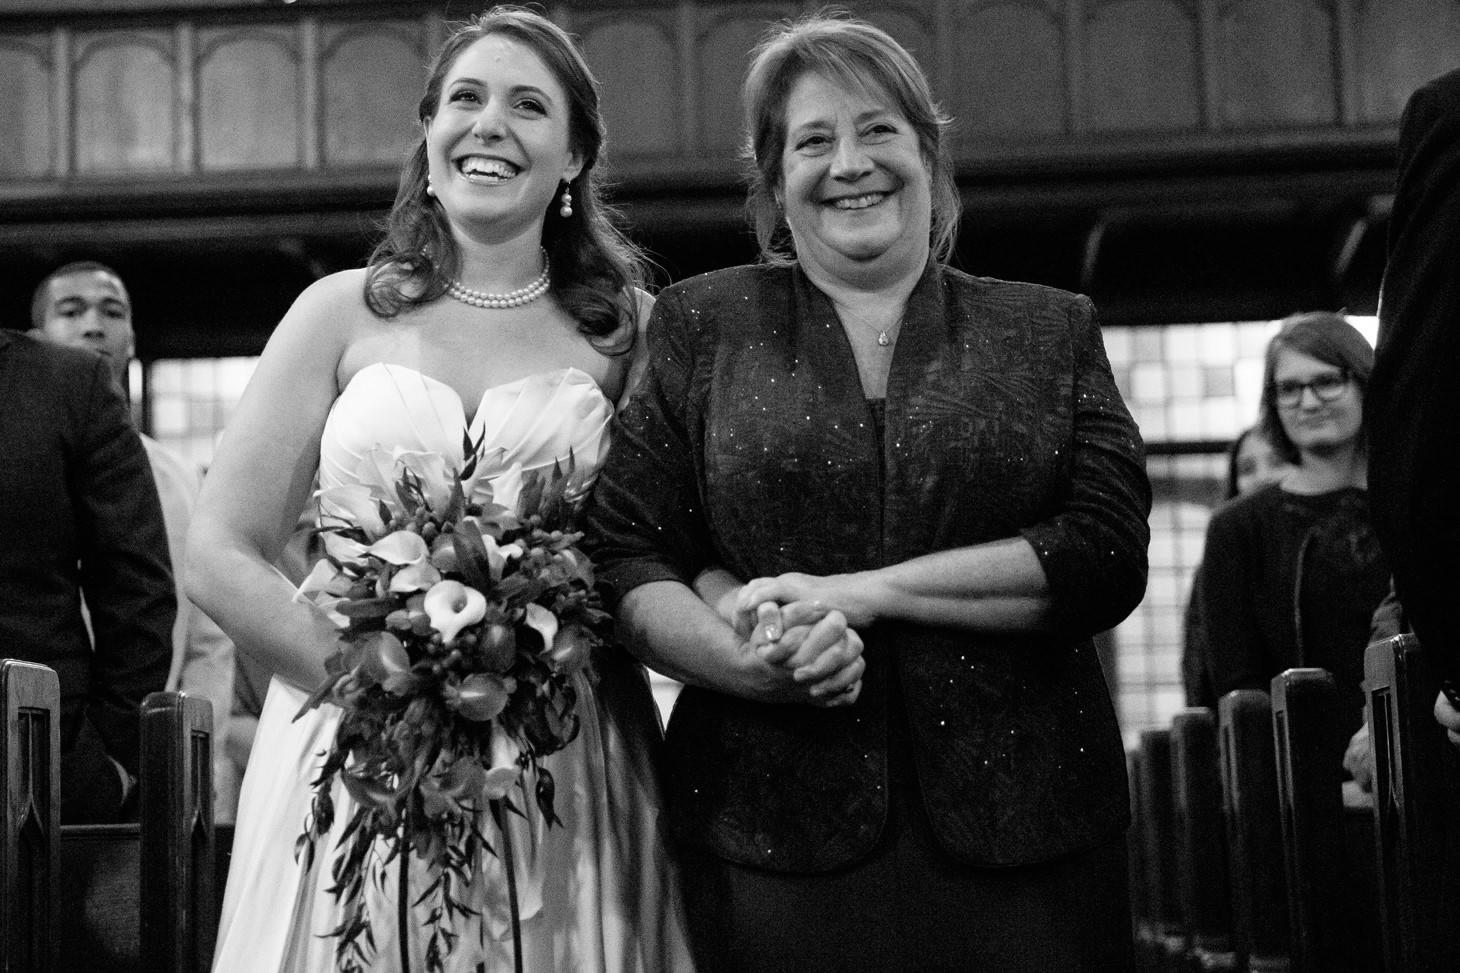 019-nyc-wedding-photographer-hoboken-waterfront-wedding-photos-smitten-chickens.jpg